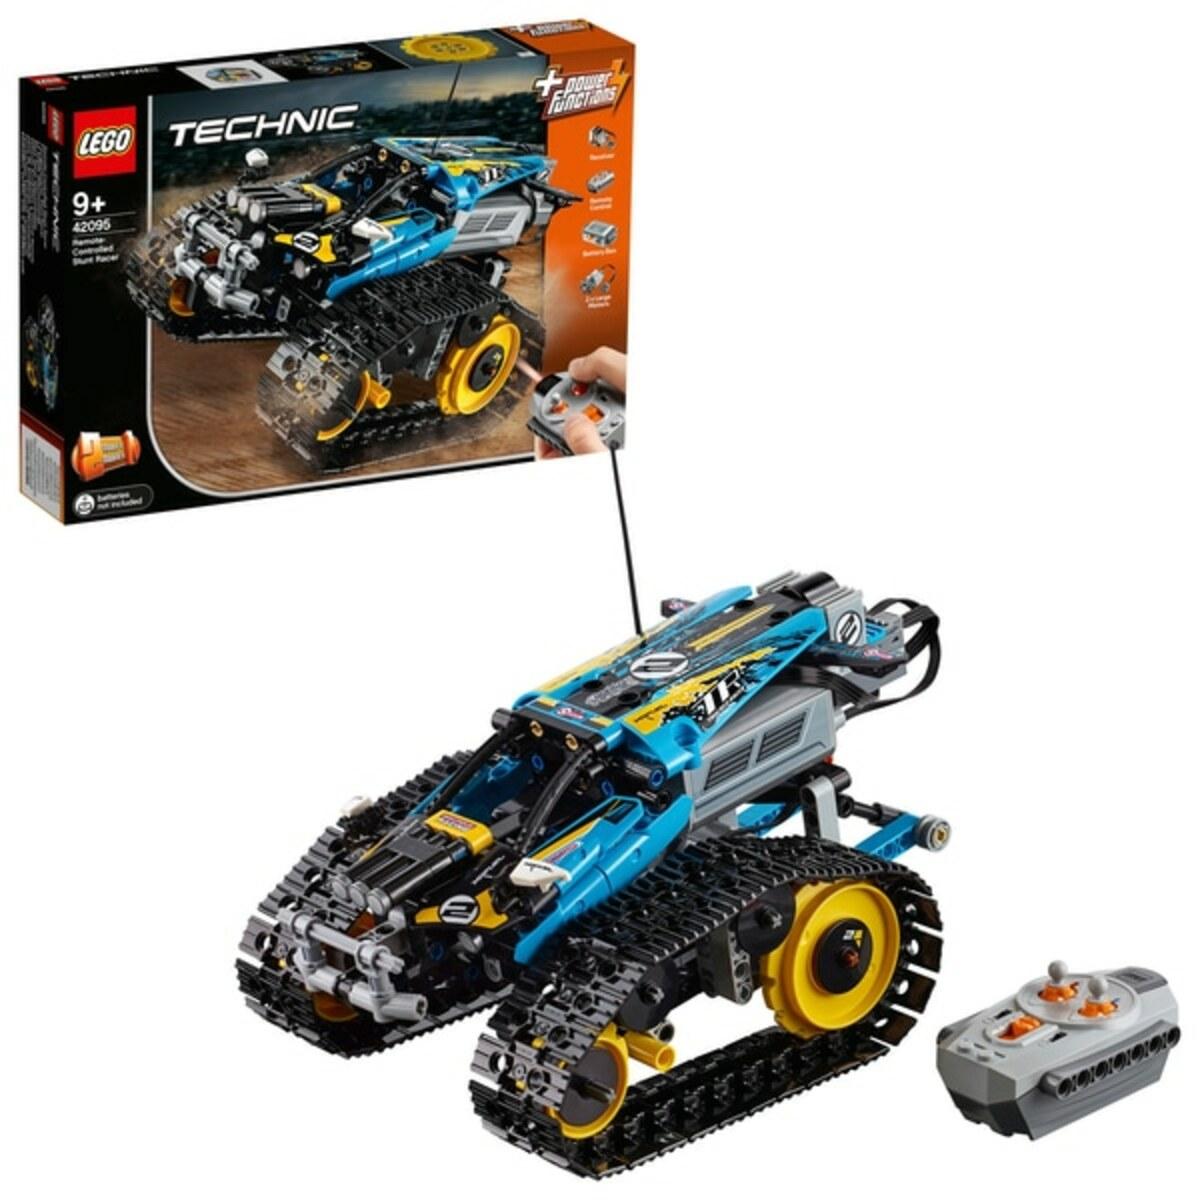 Bild 5 von LEGO Technic - 42095 Ferngesteuerter Stunt-Racer